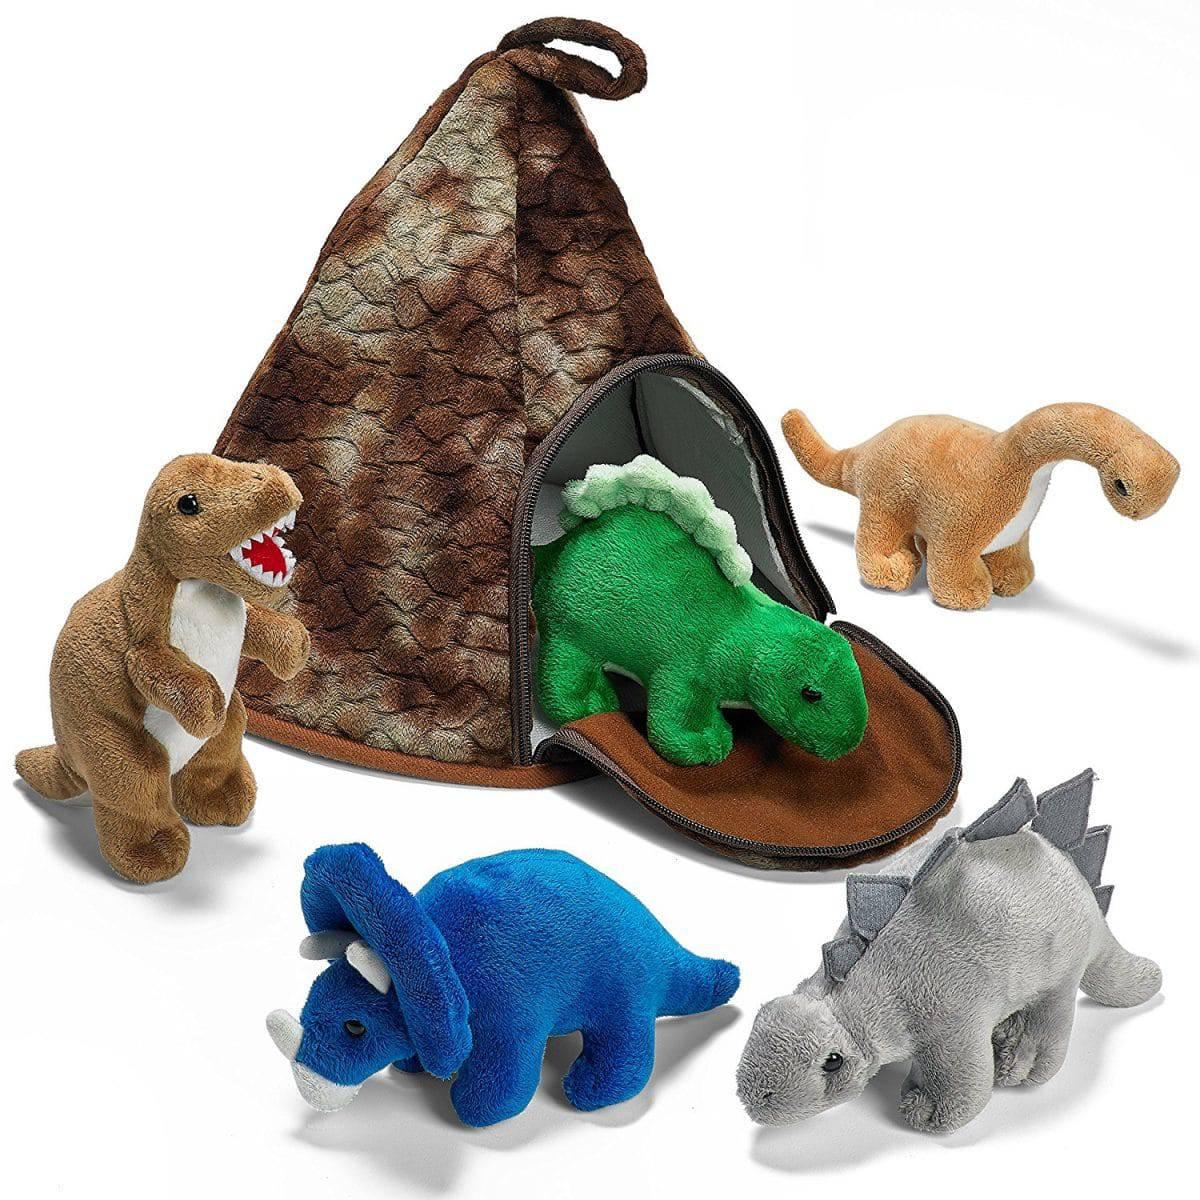 Kids Dinosaur Truck Play Set Animal Figures Toys Toddler Boy Gift Pretend New